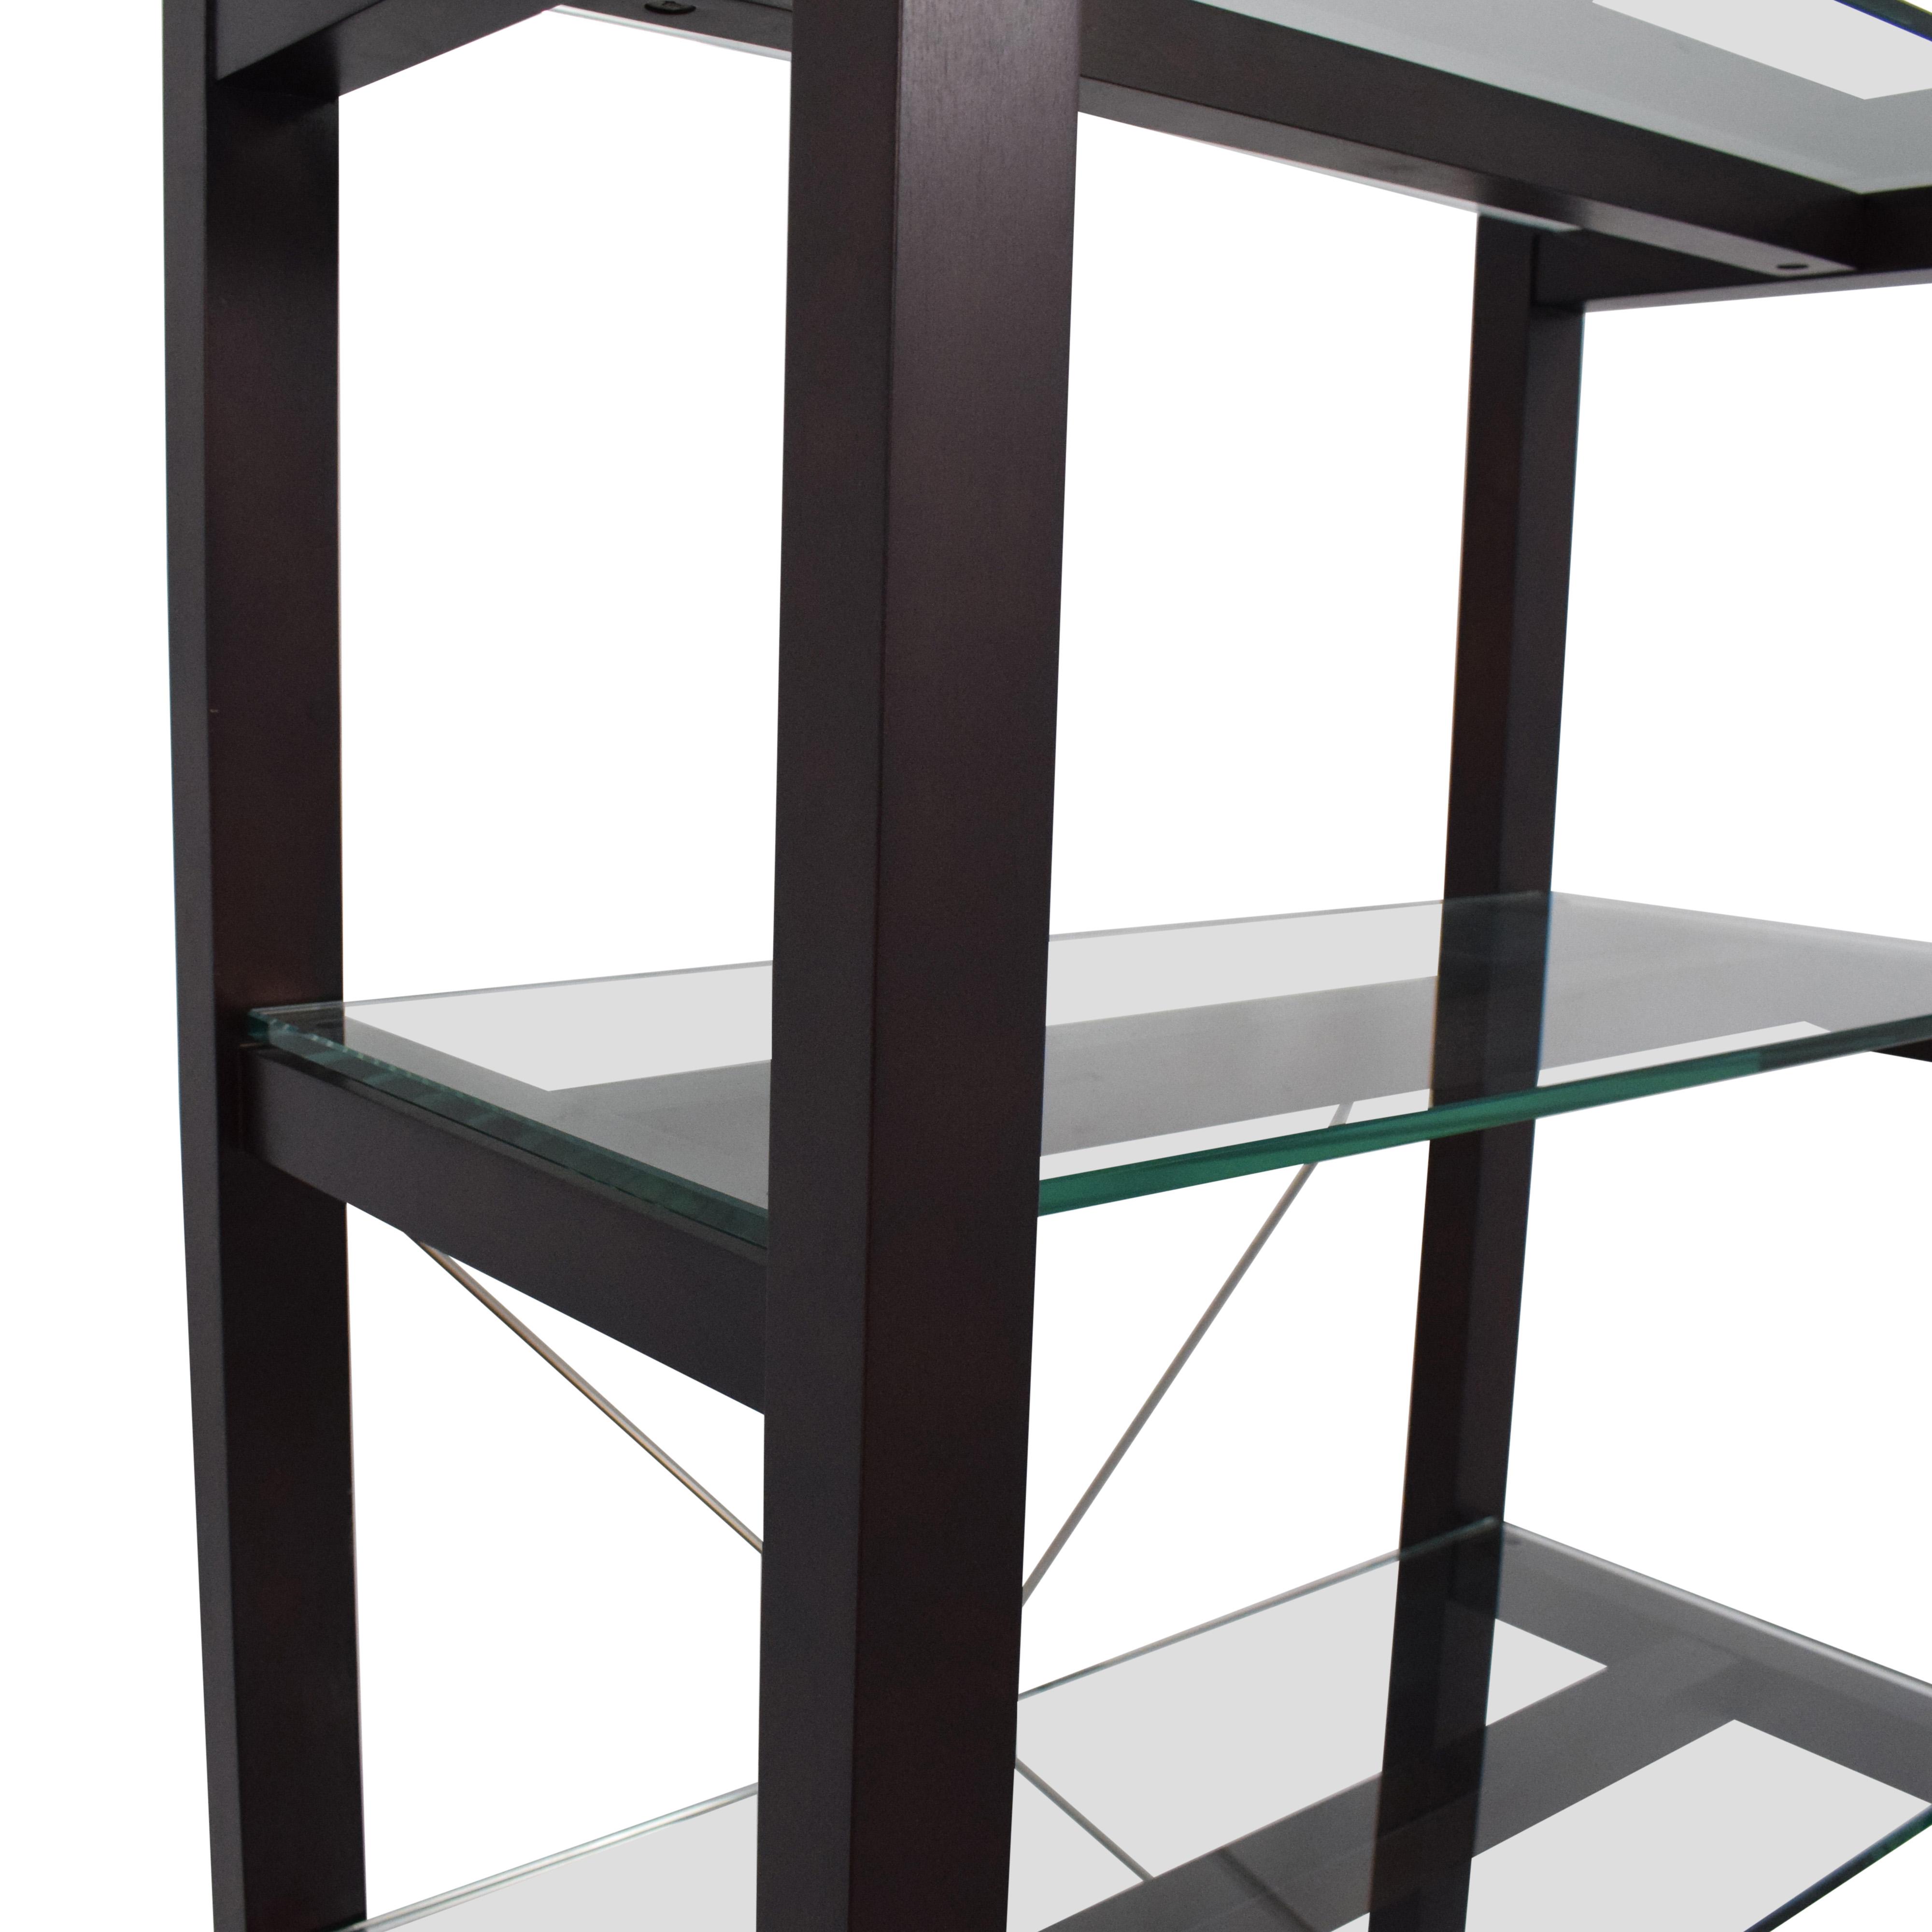 Crate & Barrel Drake Bookcase / Storage